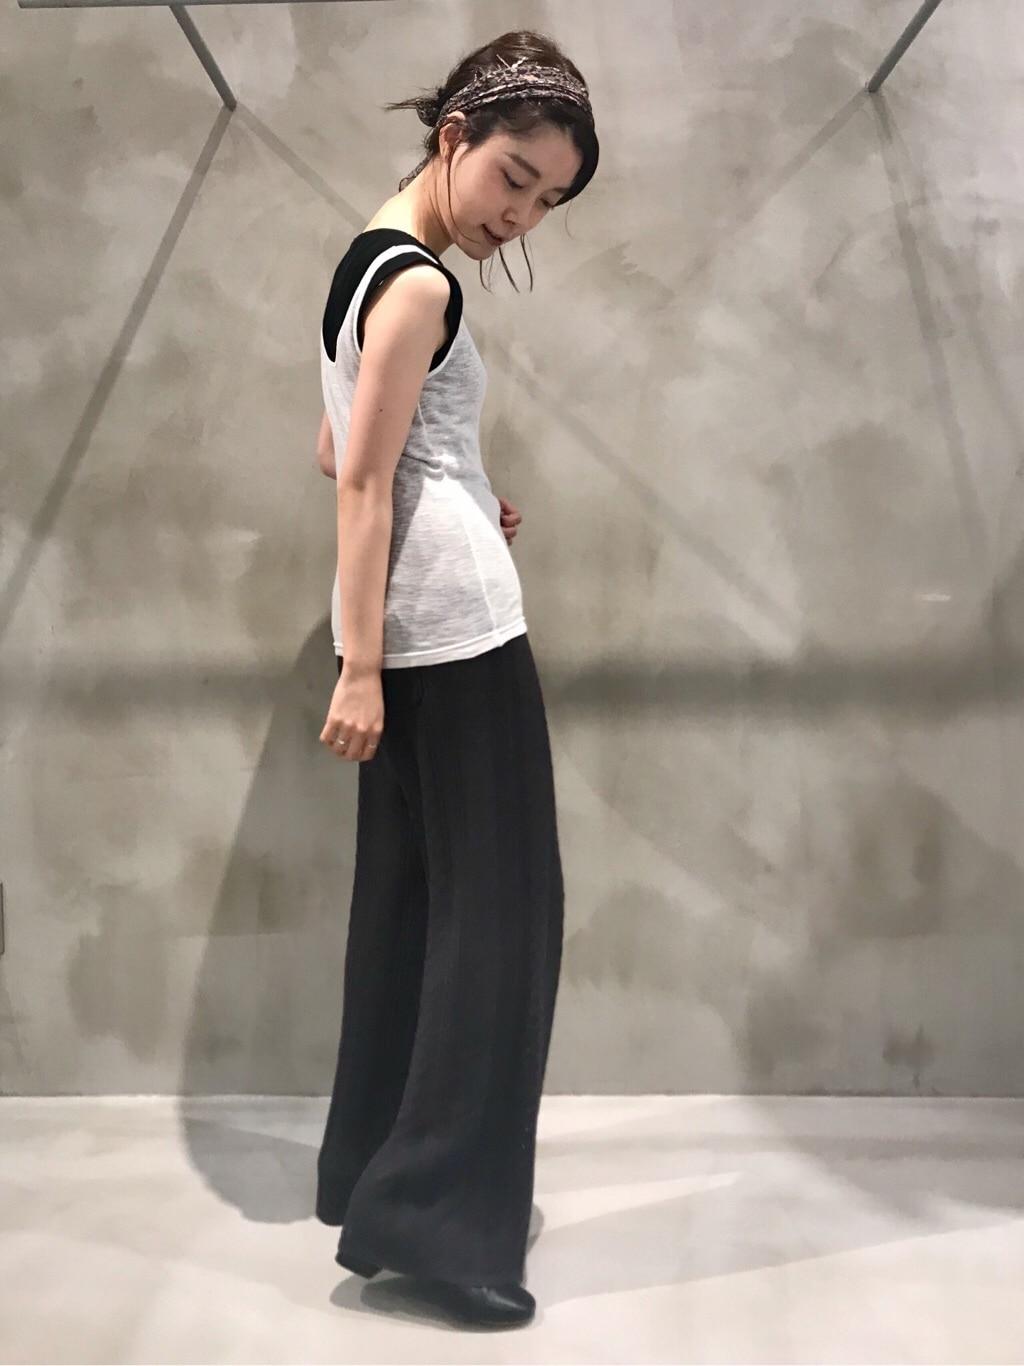 bulle de savon 渋谷スクランブルスクエア 身長:153cm 2020.06.26